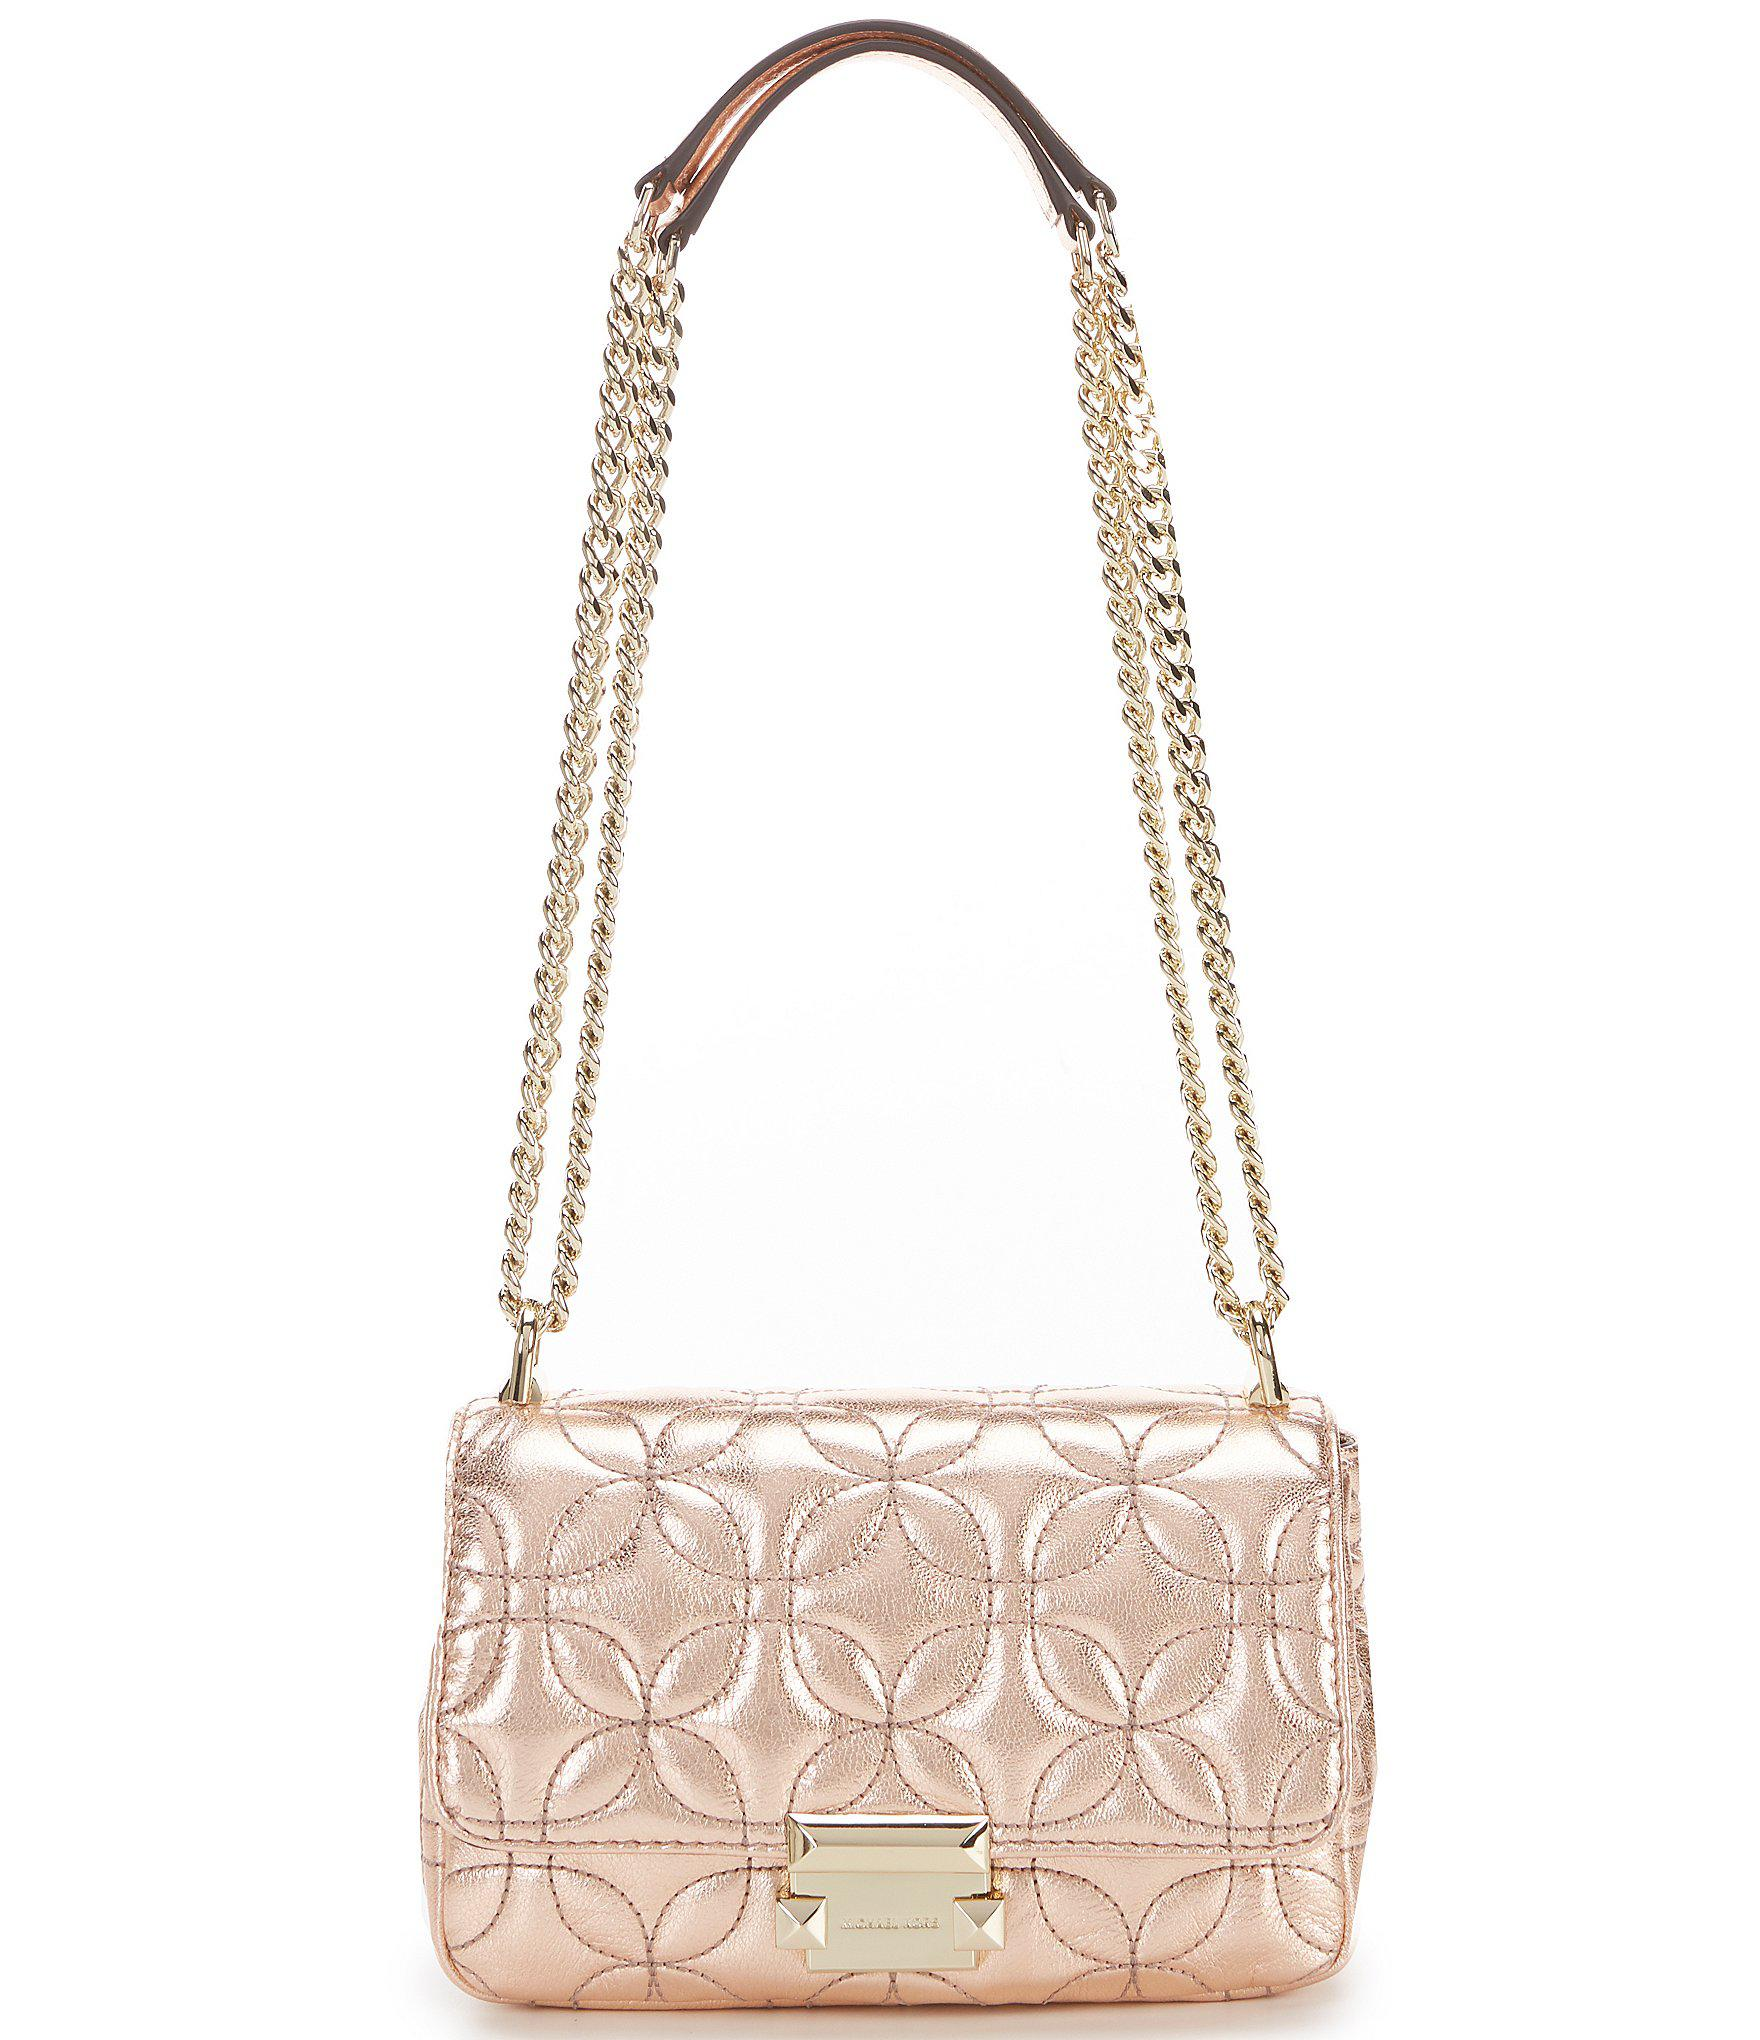 51043c019efec MICHAEL Michael Kors. Women s Sloan Small Chain Metallic Shoulder Bag